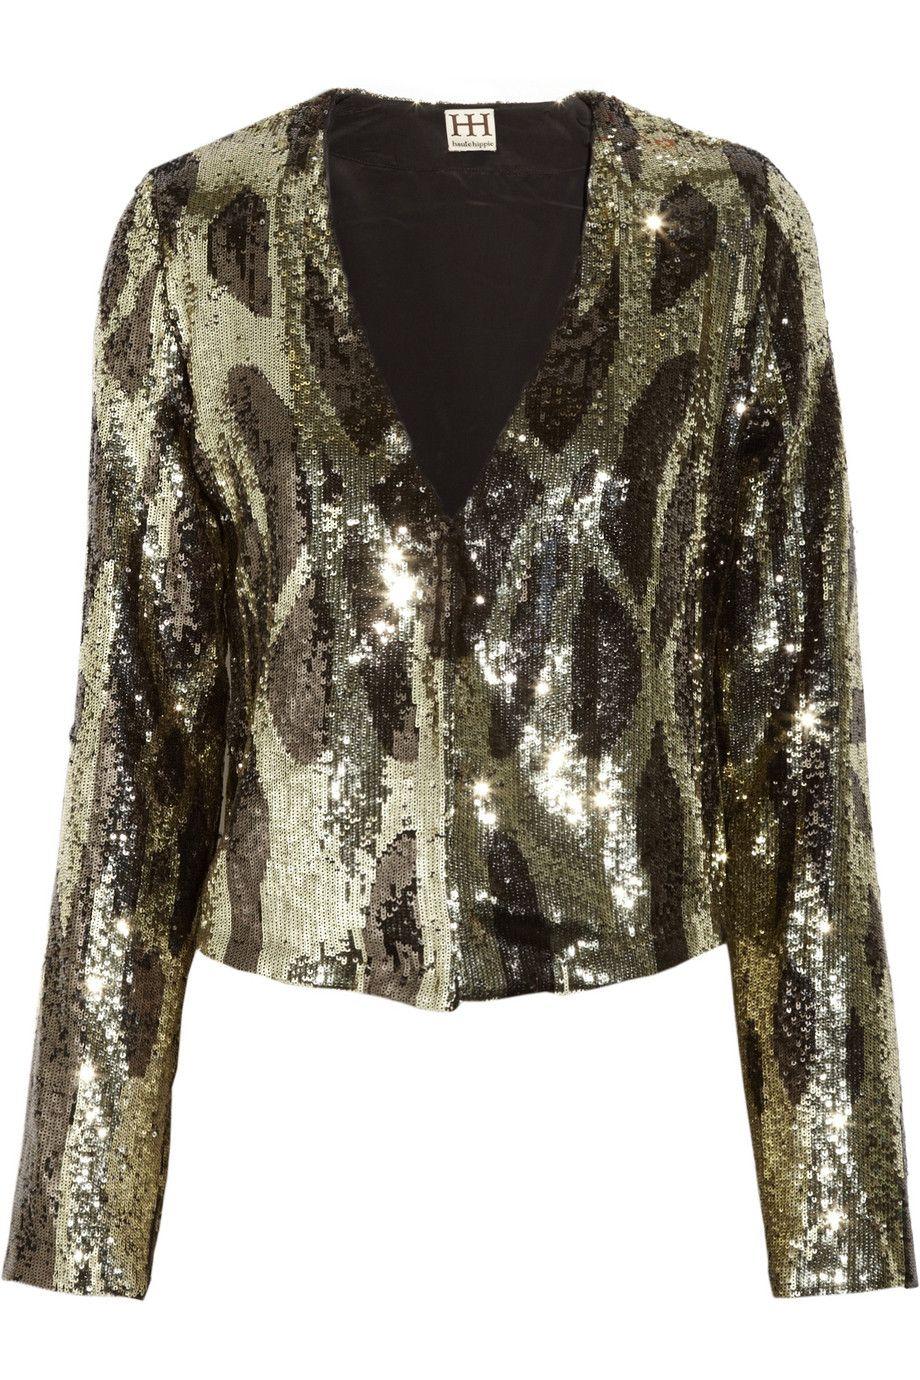 Patterned sequined jacket